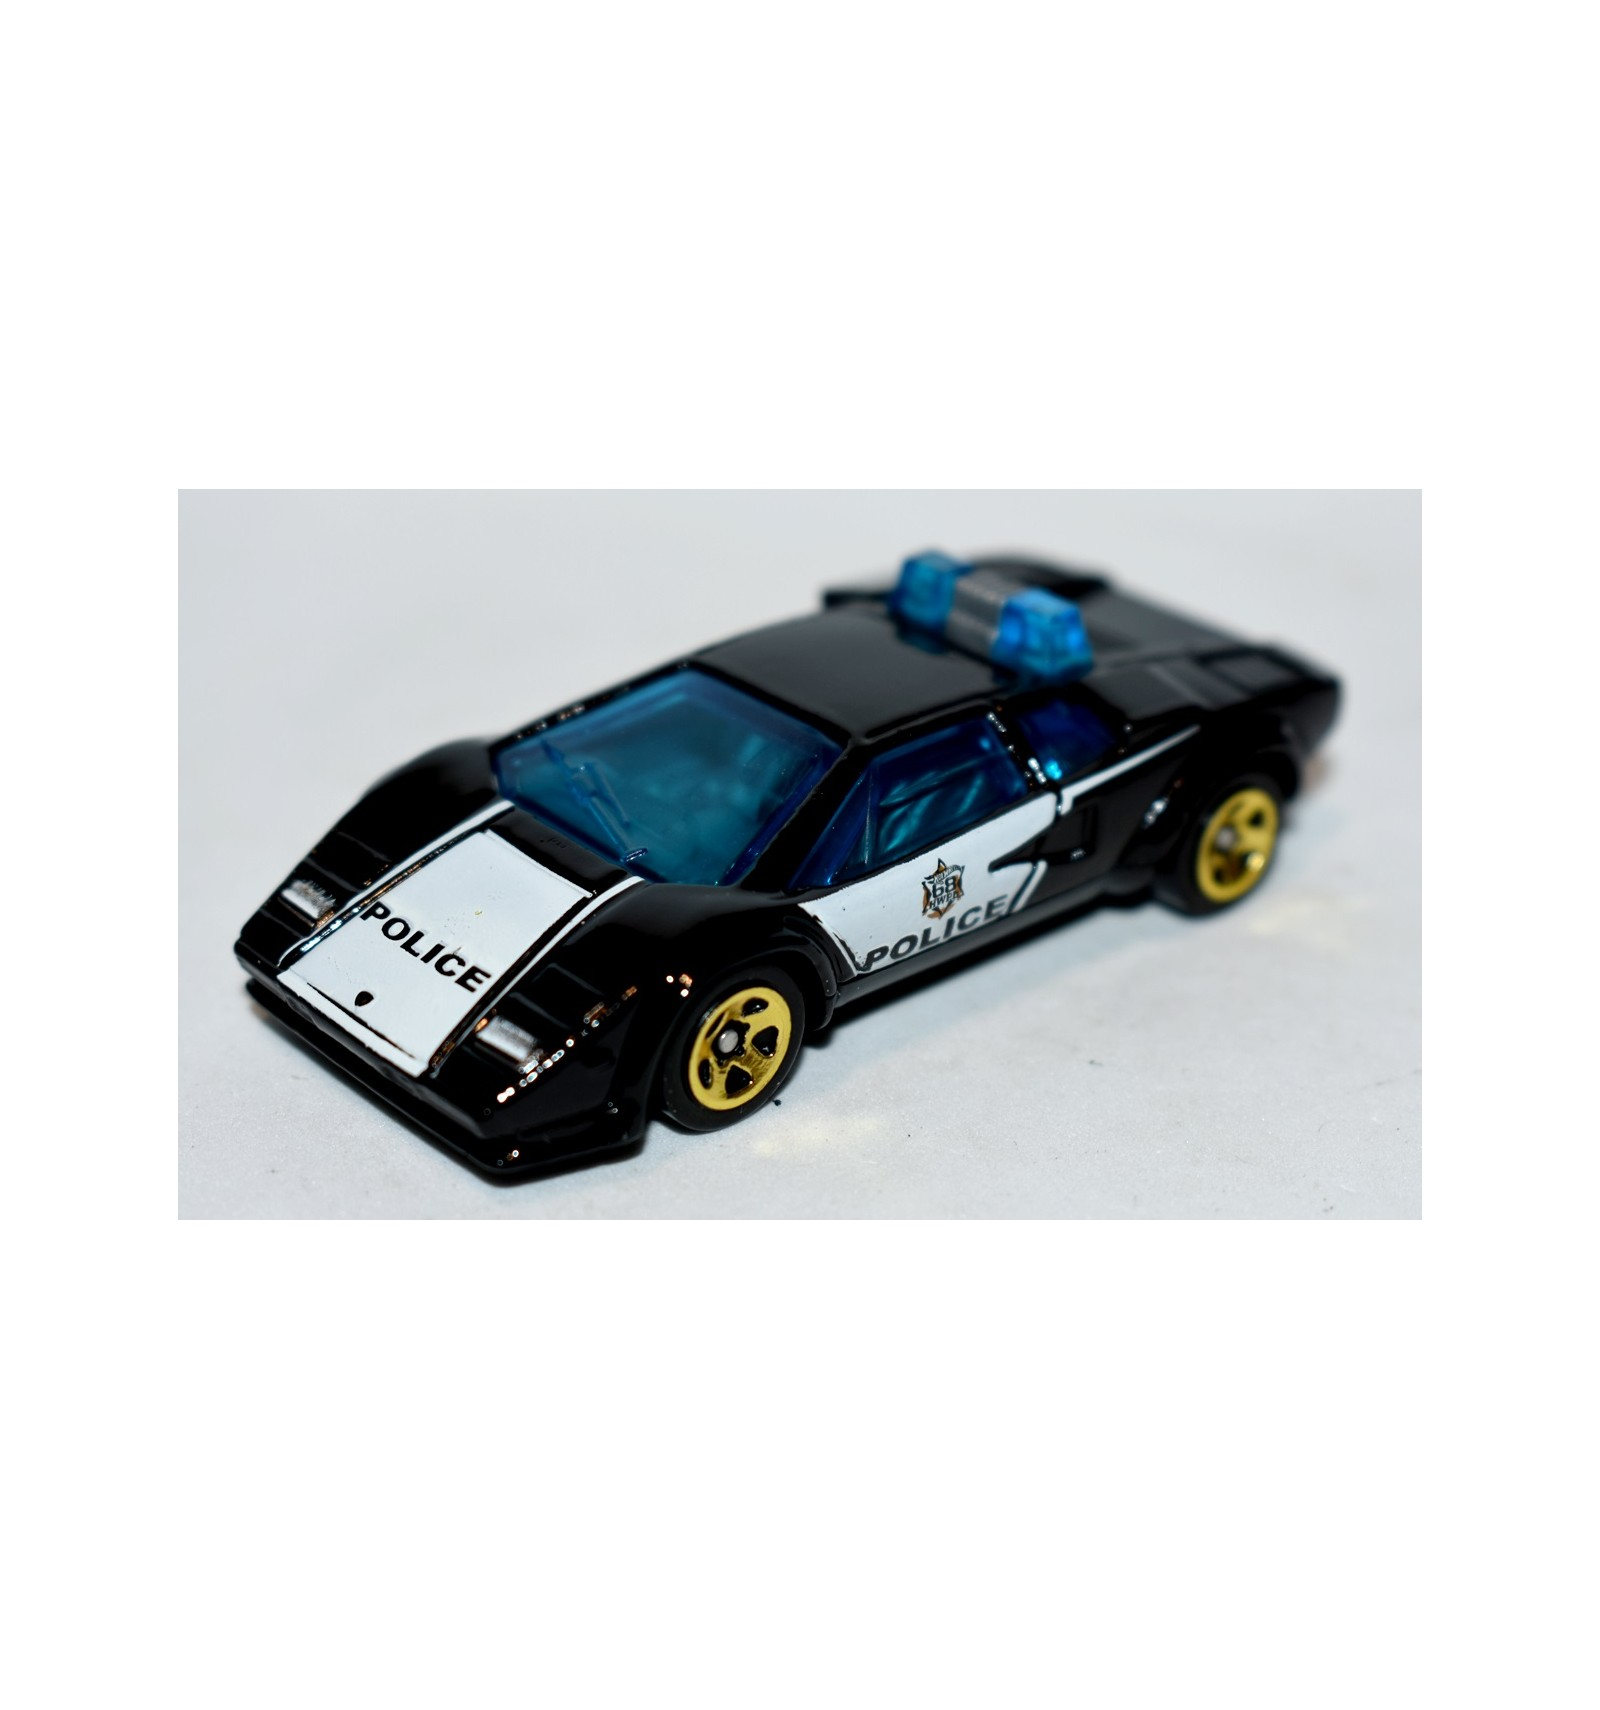 Hot Wheels Lamborghini Countach Police Patrol Car Global Diecast